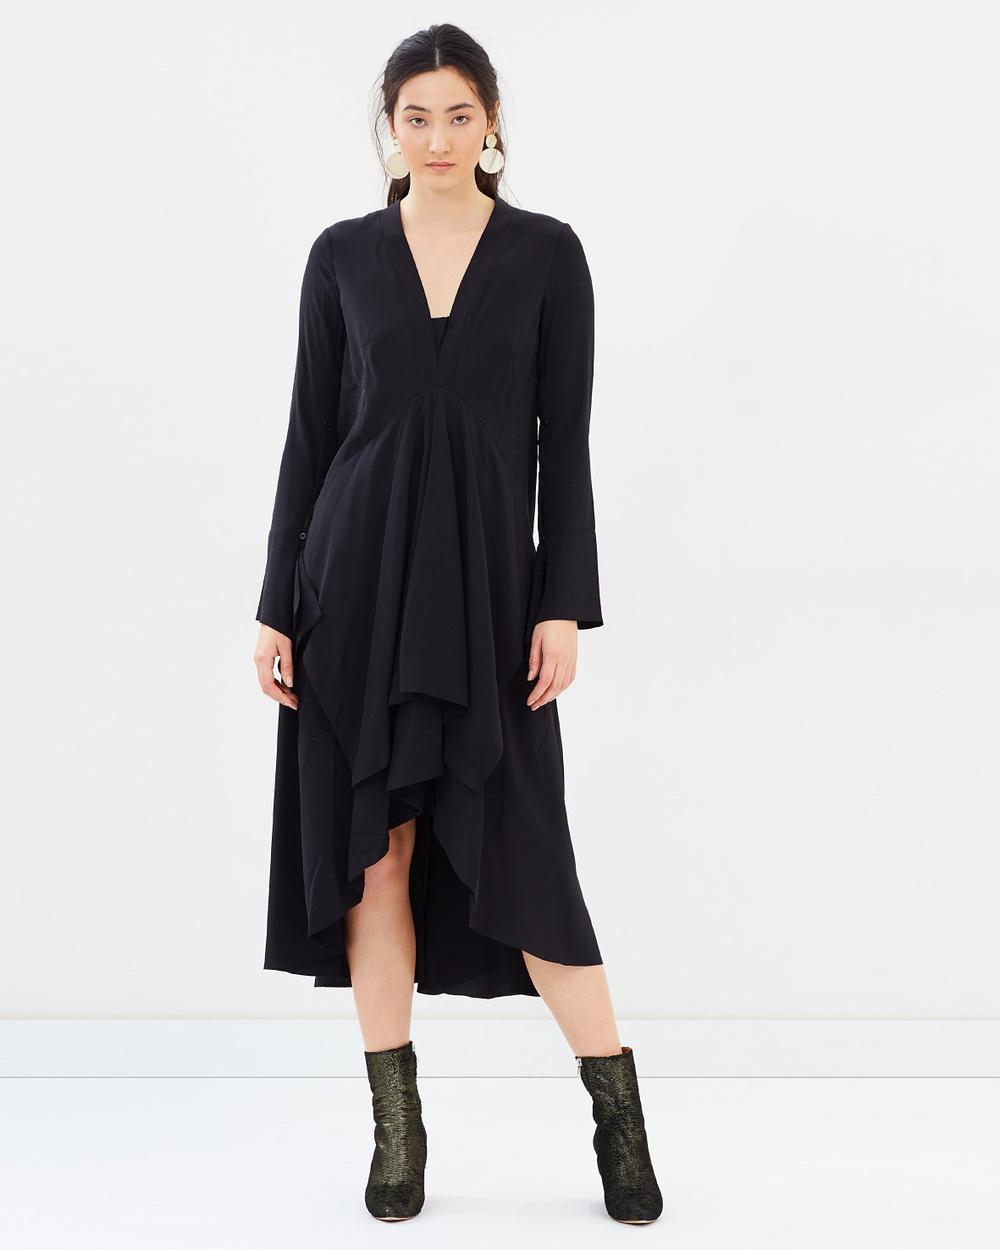 KITX Provider Puzzle Dress Dresses Black Provider Puzzle Dress